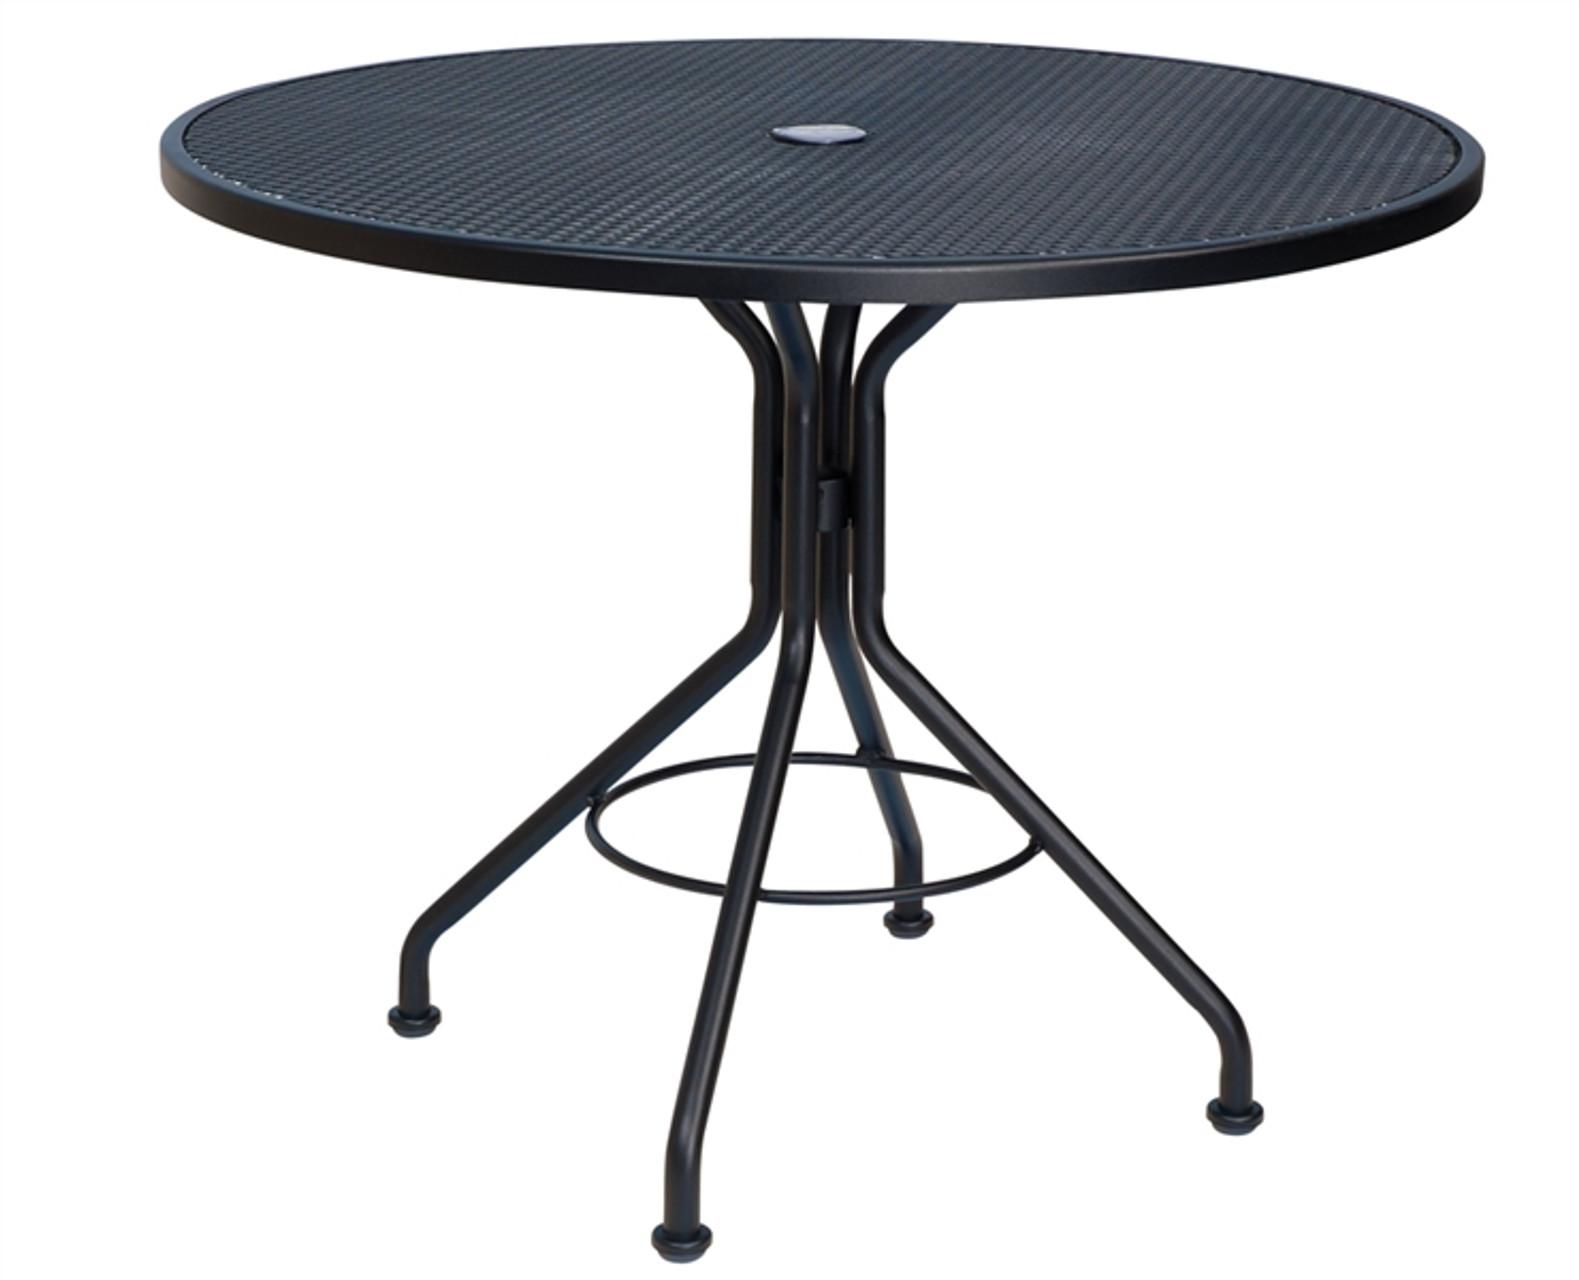 woodard outdoor 36 round bistro umbrella table